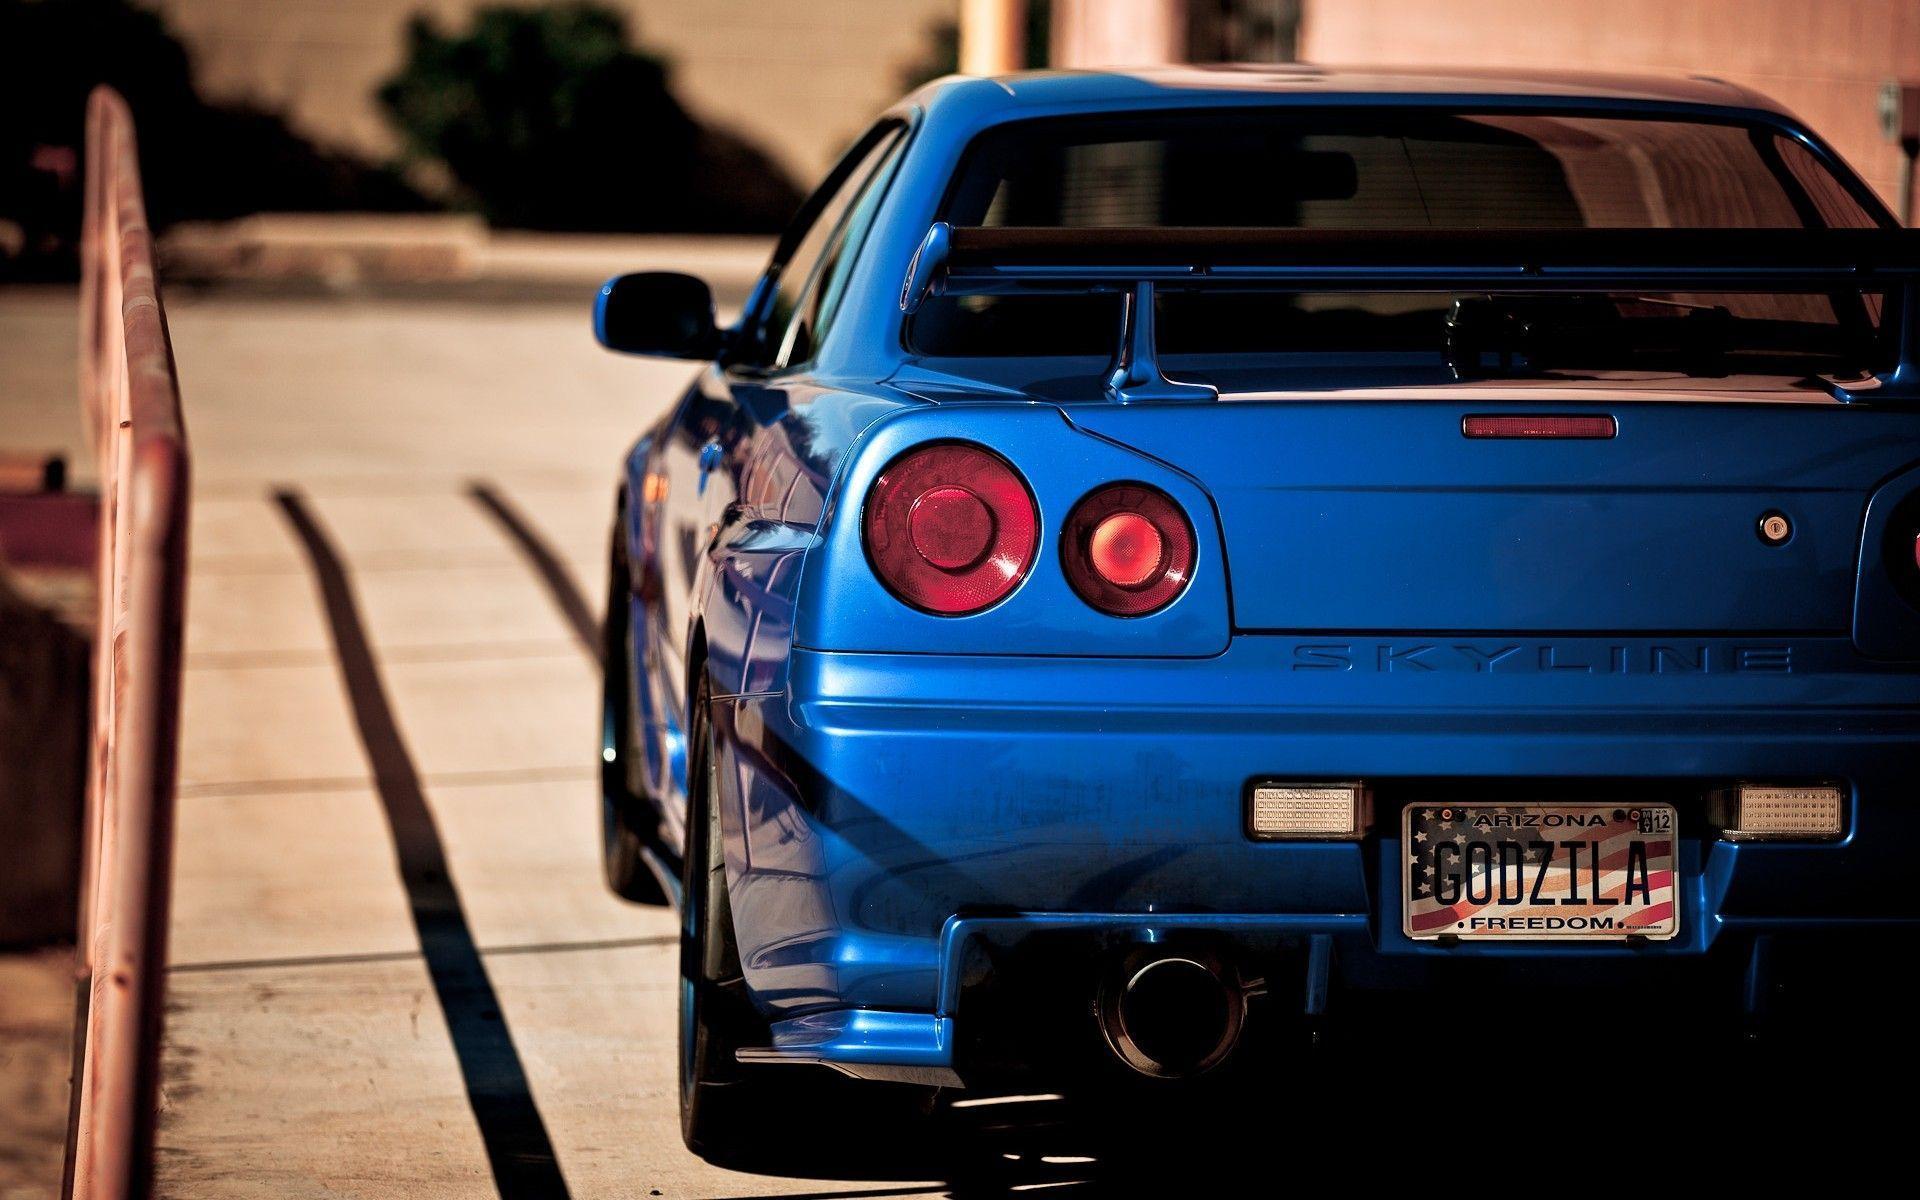 Best Nissan Skyline Gtr R34 Wallpapers | Cars | Pinterest | Cars ...